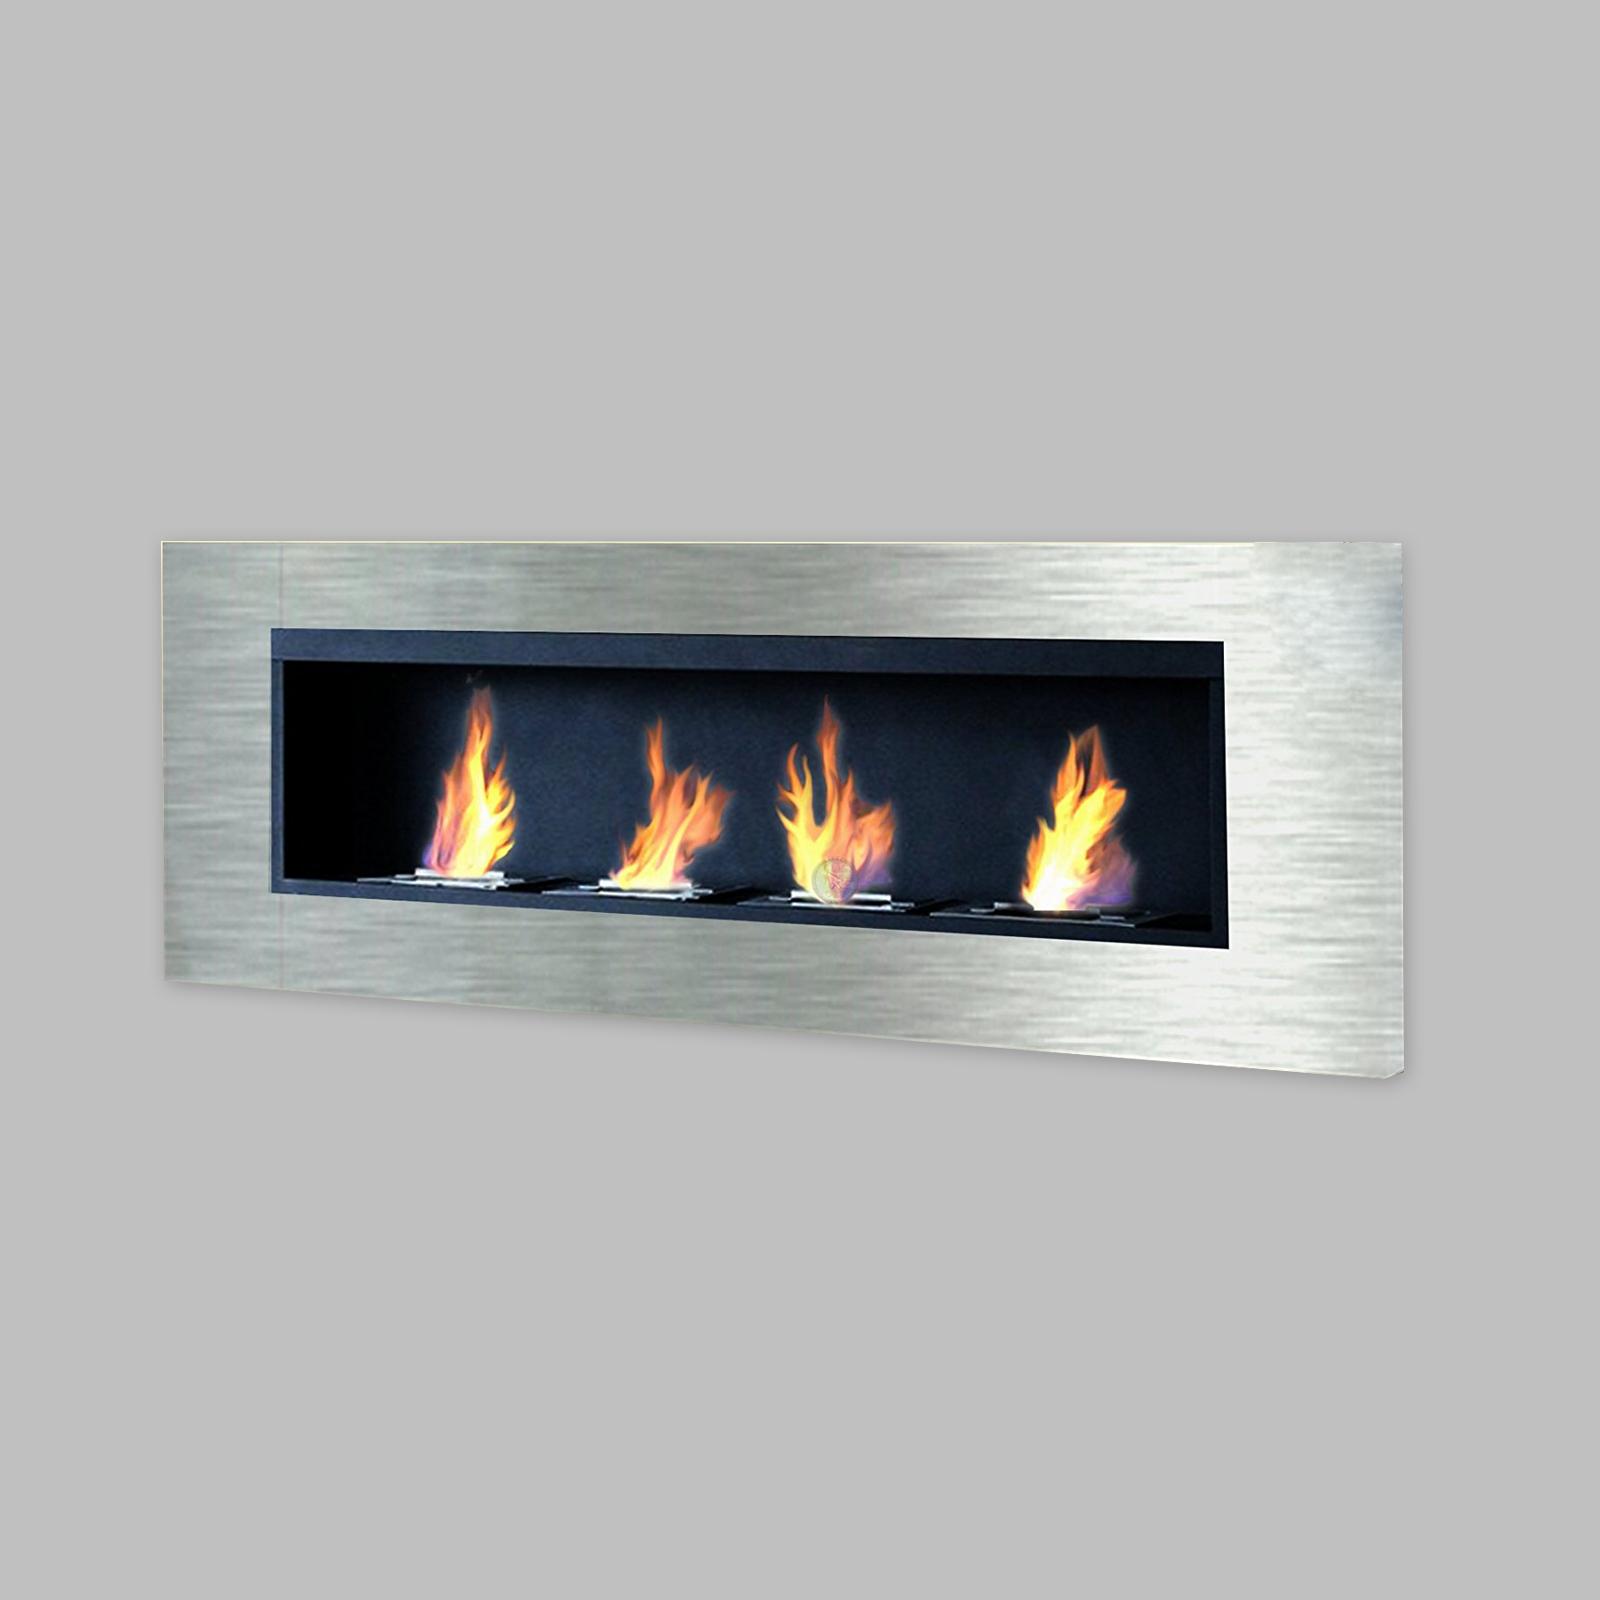 Luxury stainless steel bio ethanol fireplace gelkamin gel for Alcohol gel fireplace